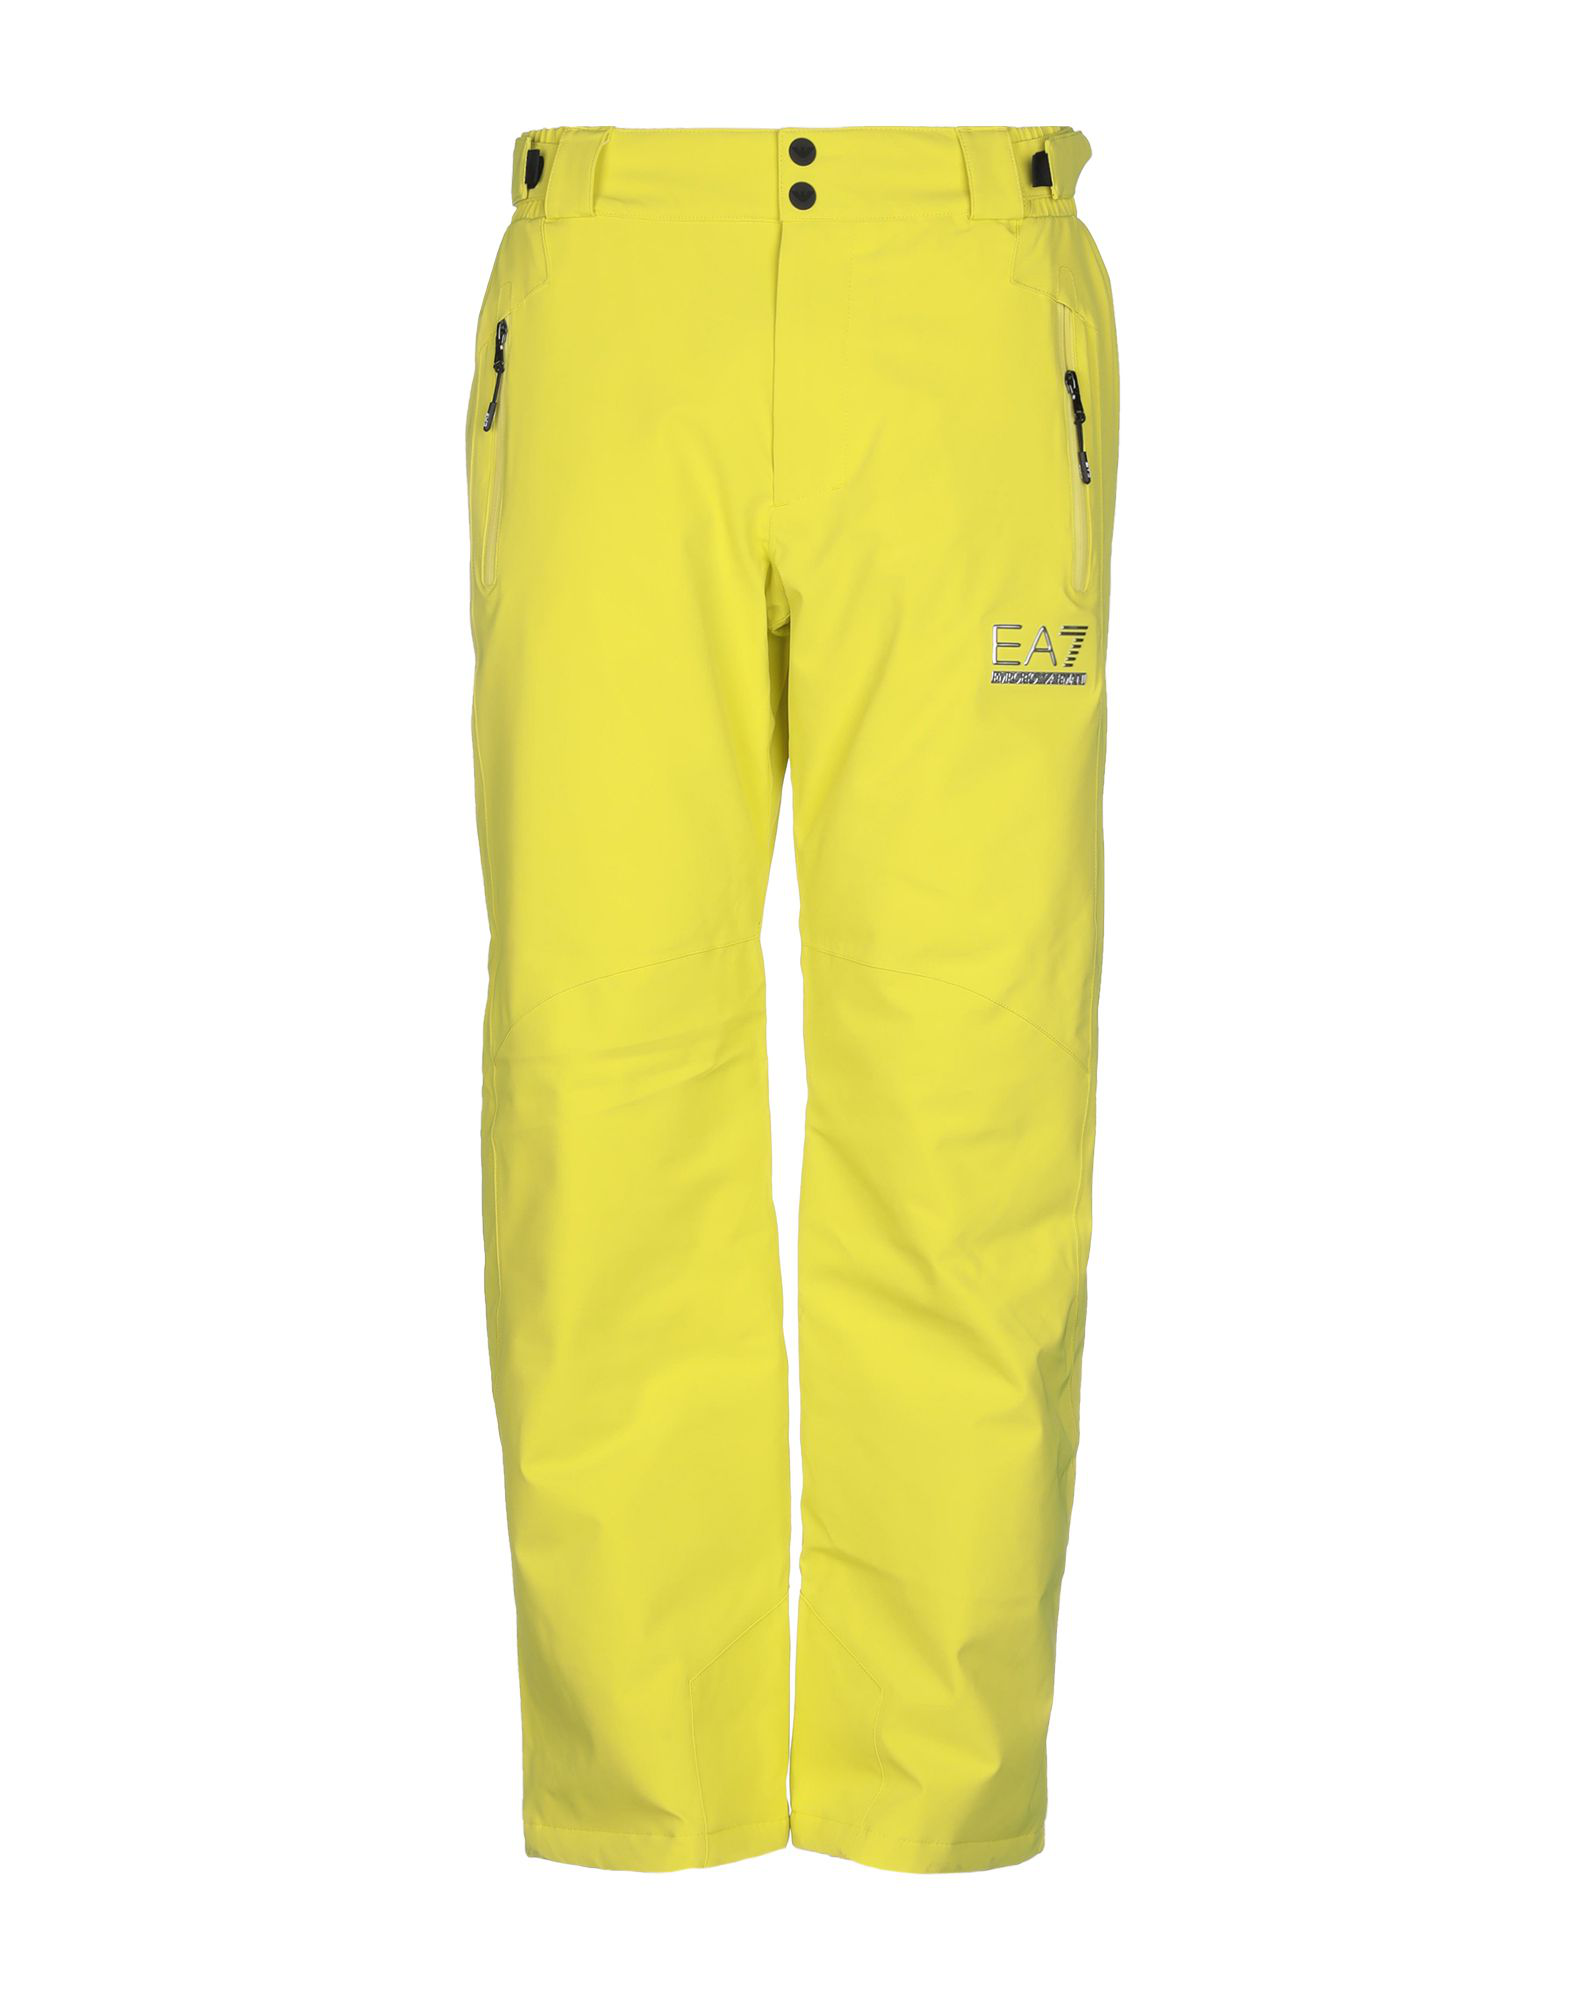 greatvarieties aliexpress hot-selling latest Ski Pants in Yellow